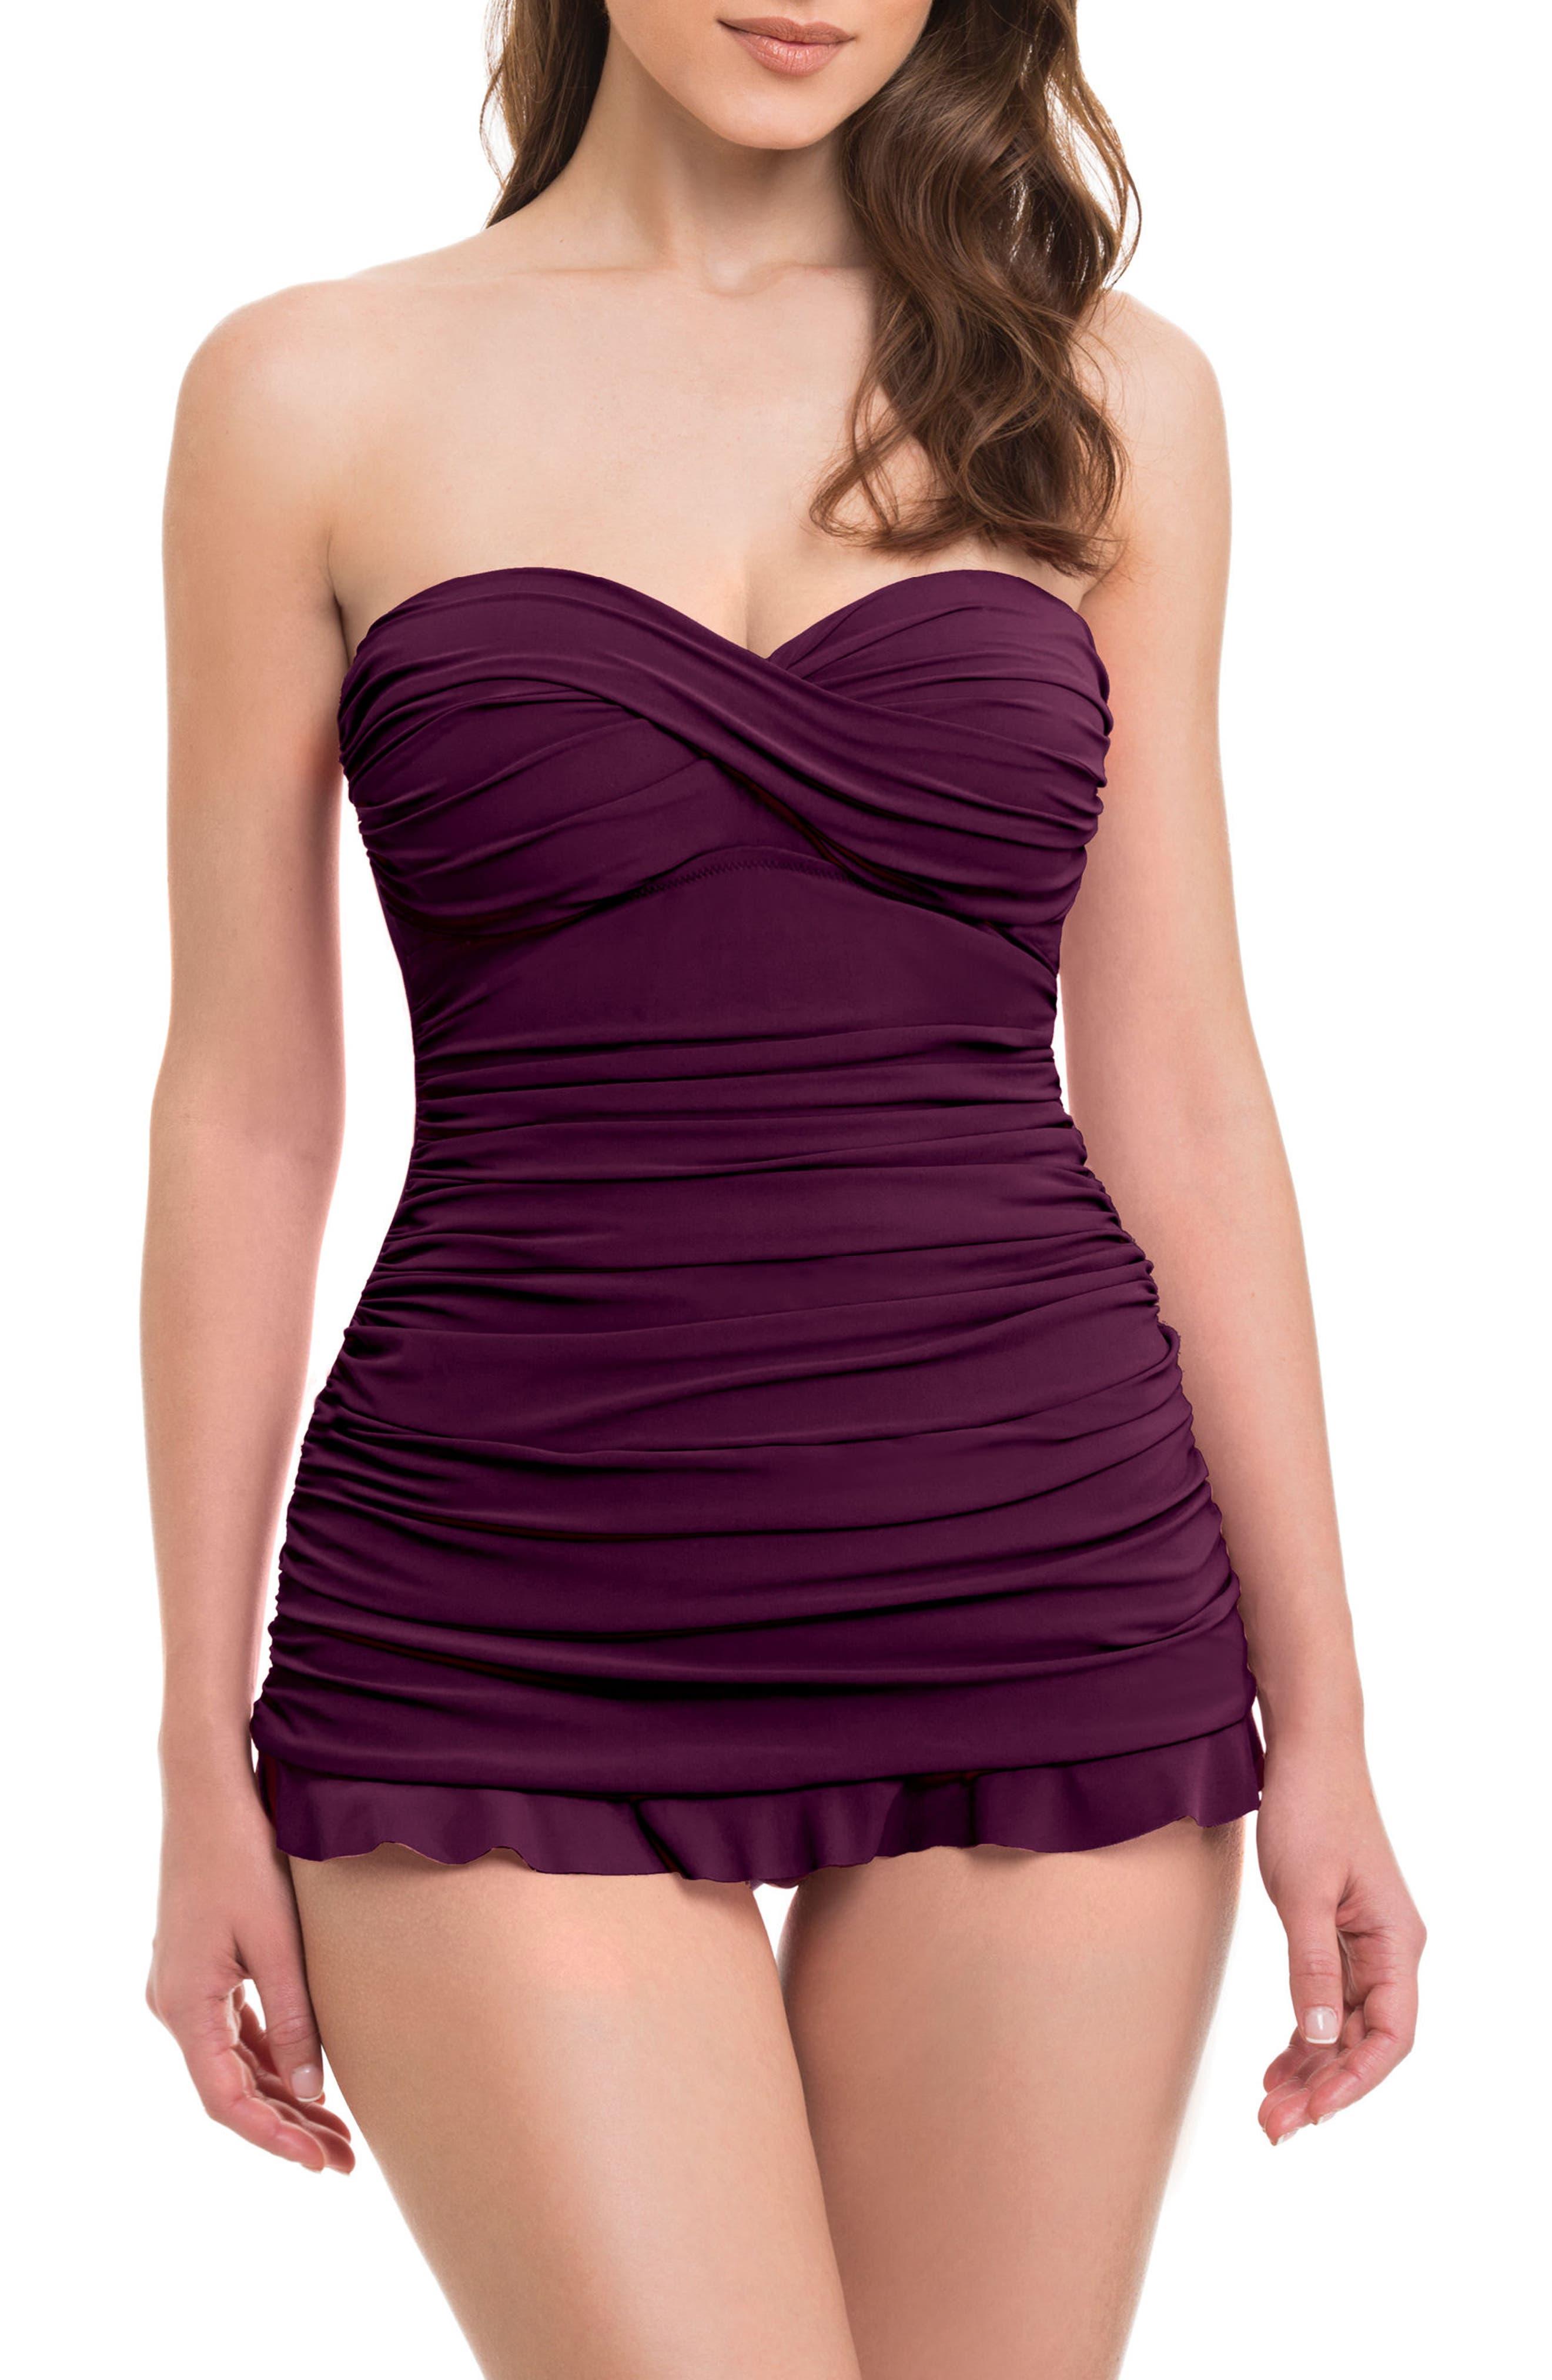 Main Image - Profile by Gottex 'Tutti Frutti' Swim Dress